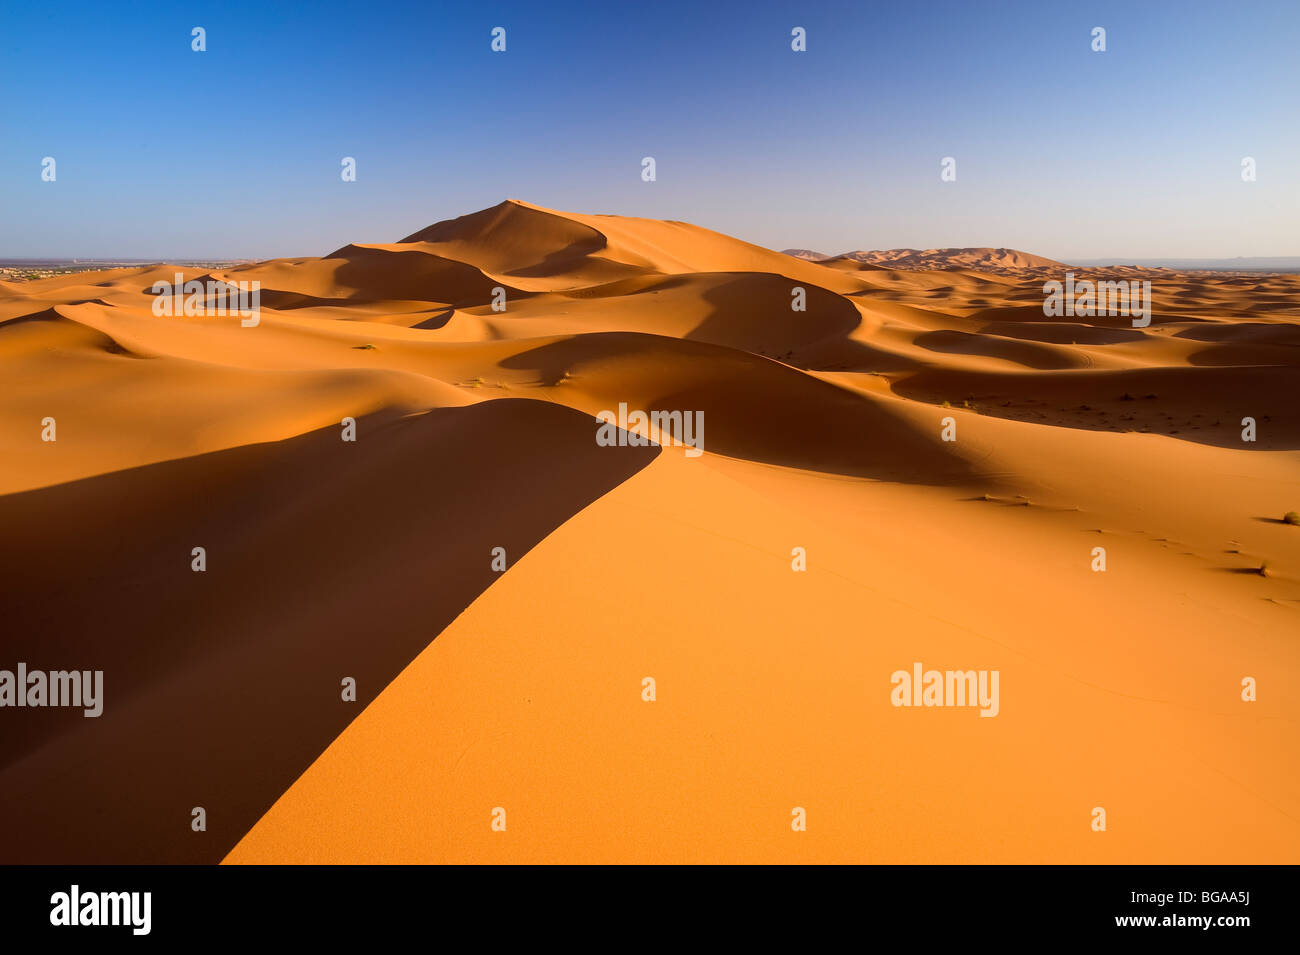 Erg Chebbi, Merzouga, Ziz Valley, Sahara Desert, Morocco - Stock Image